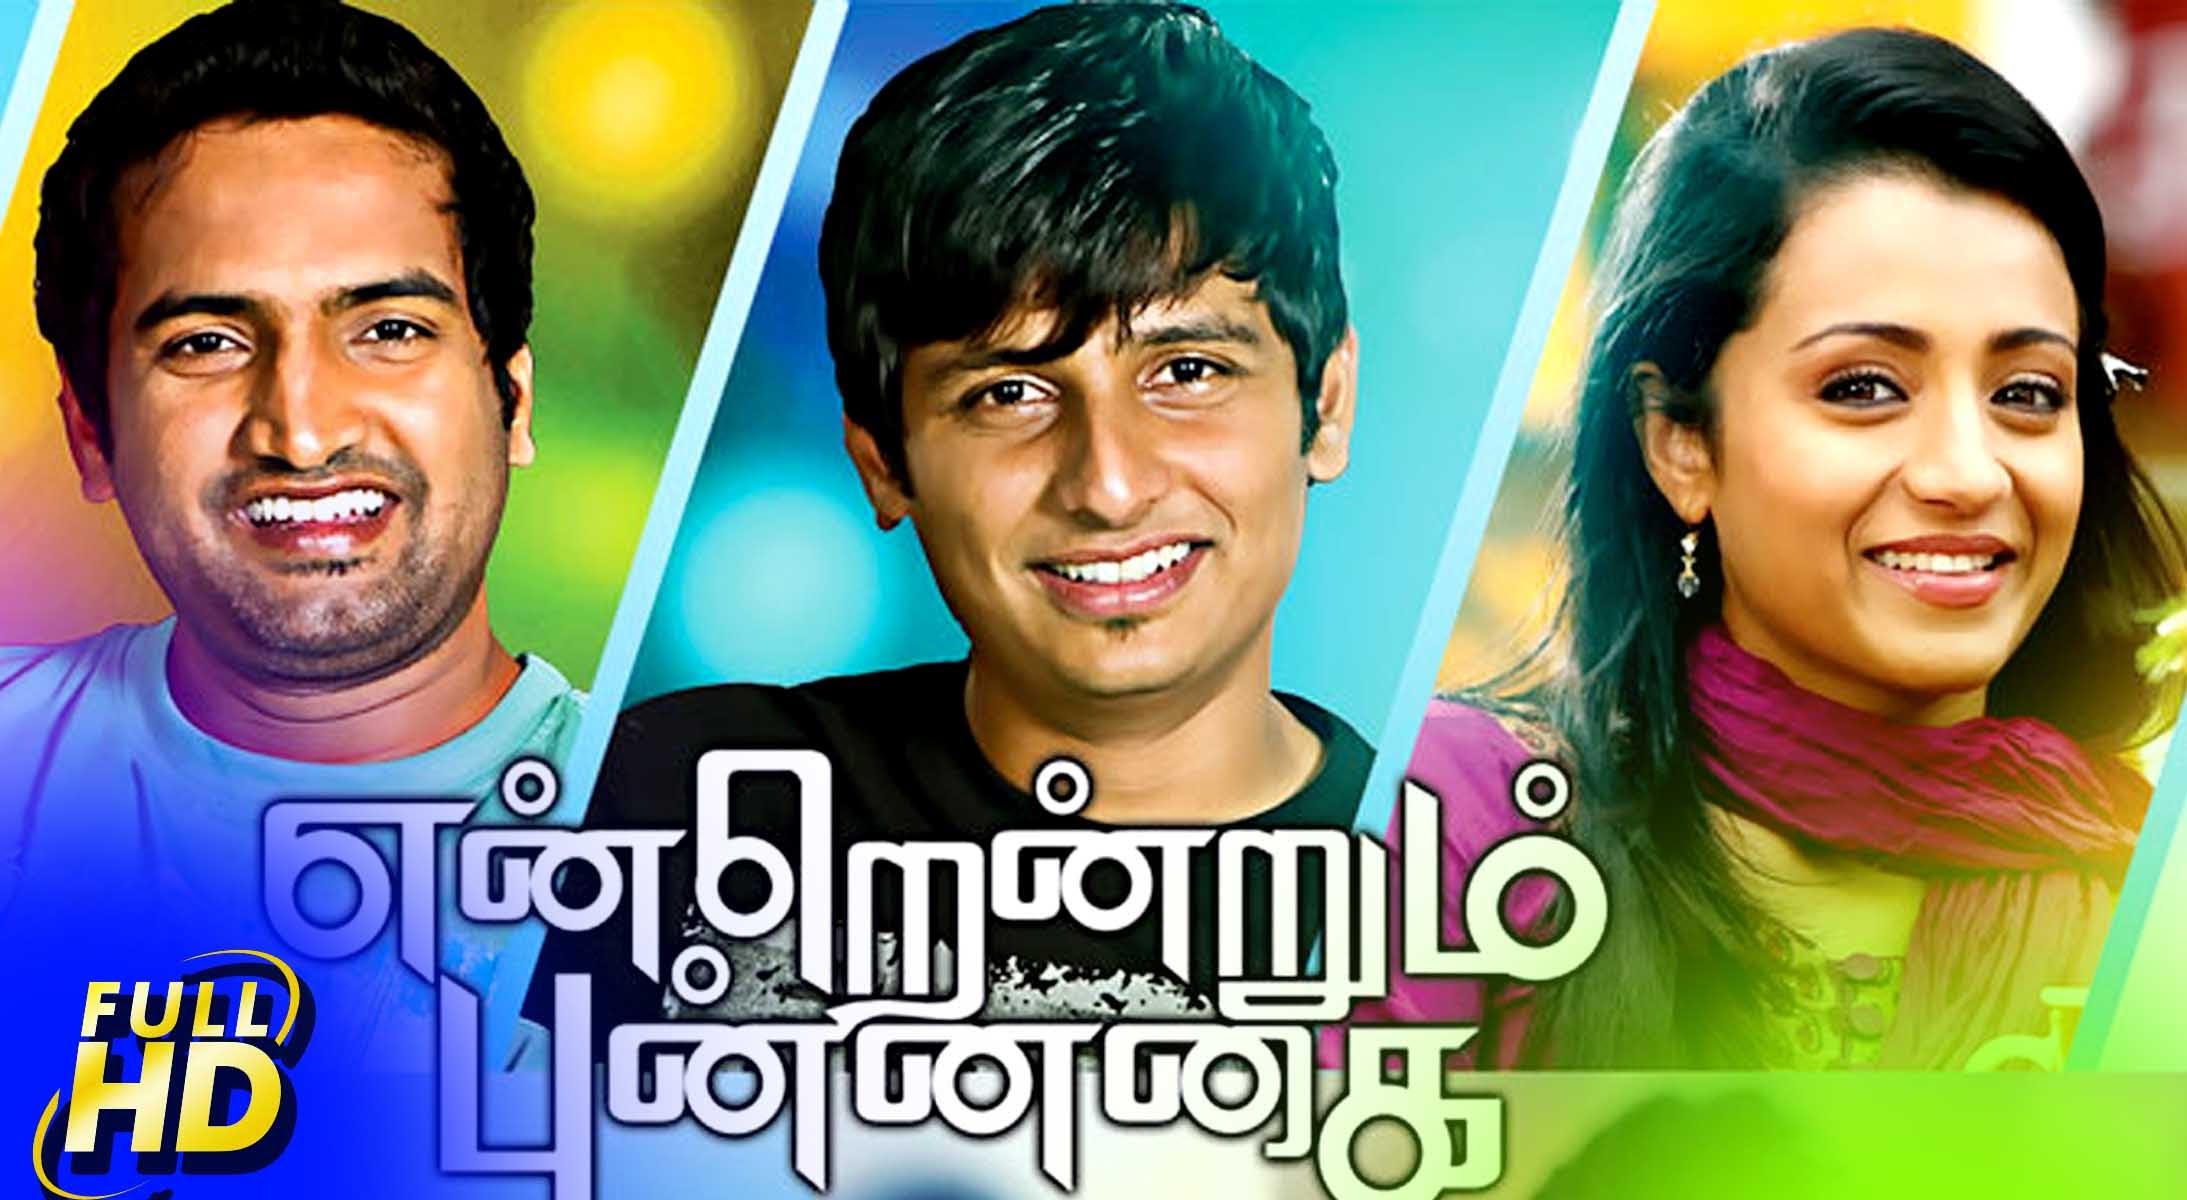 Endrendrum Punnagai 2013 Full Hd Exclusive Movie| Jeeva, Trisha, Vinay, Santhanam| Tamil Movies 2013